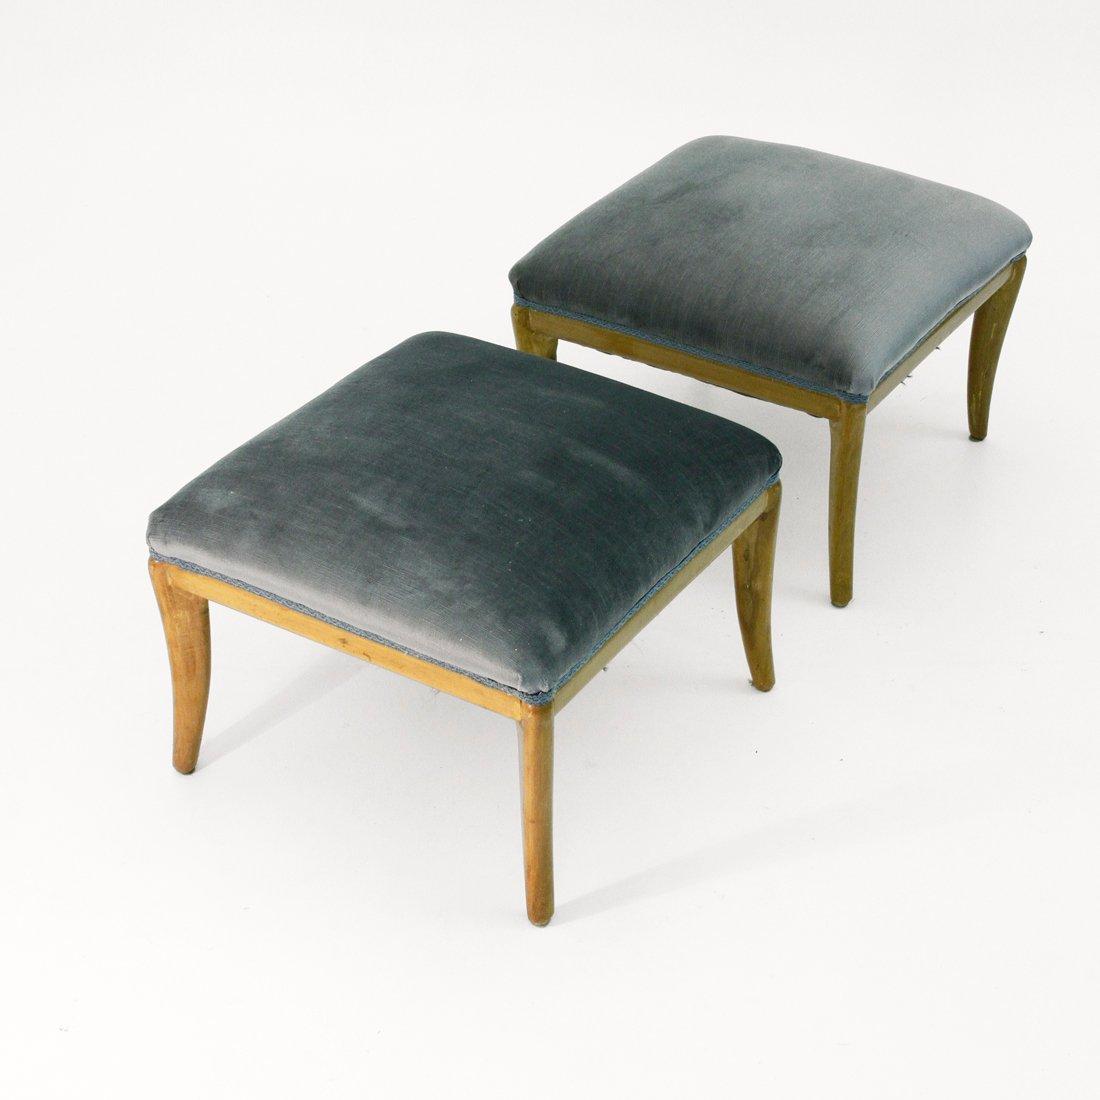 Modernist Poufs 1950s Set Of 2 For Sale At Pamono